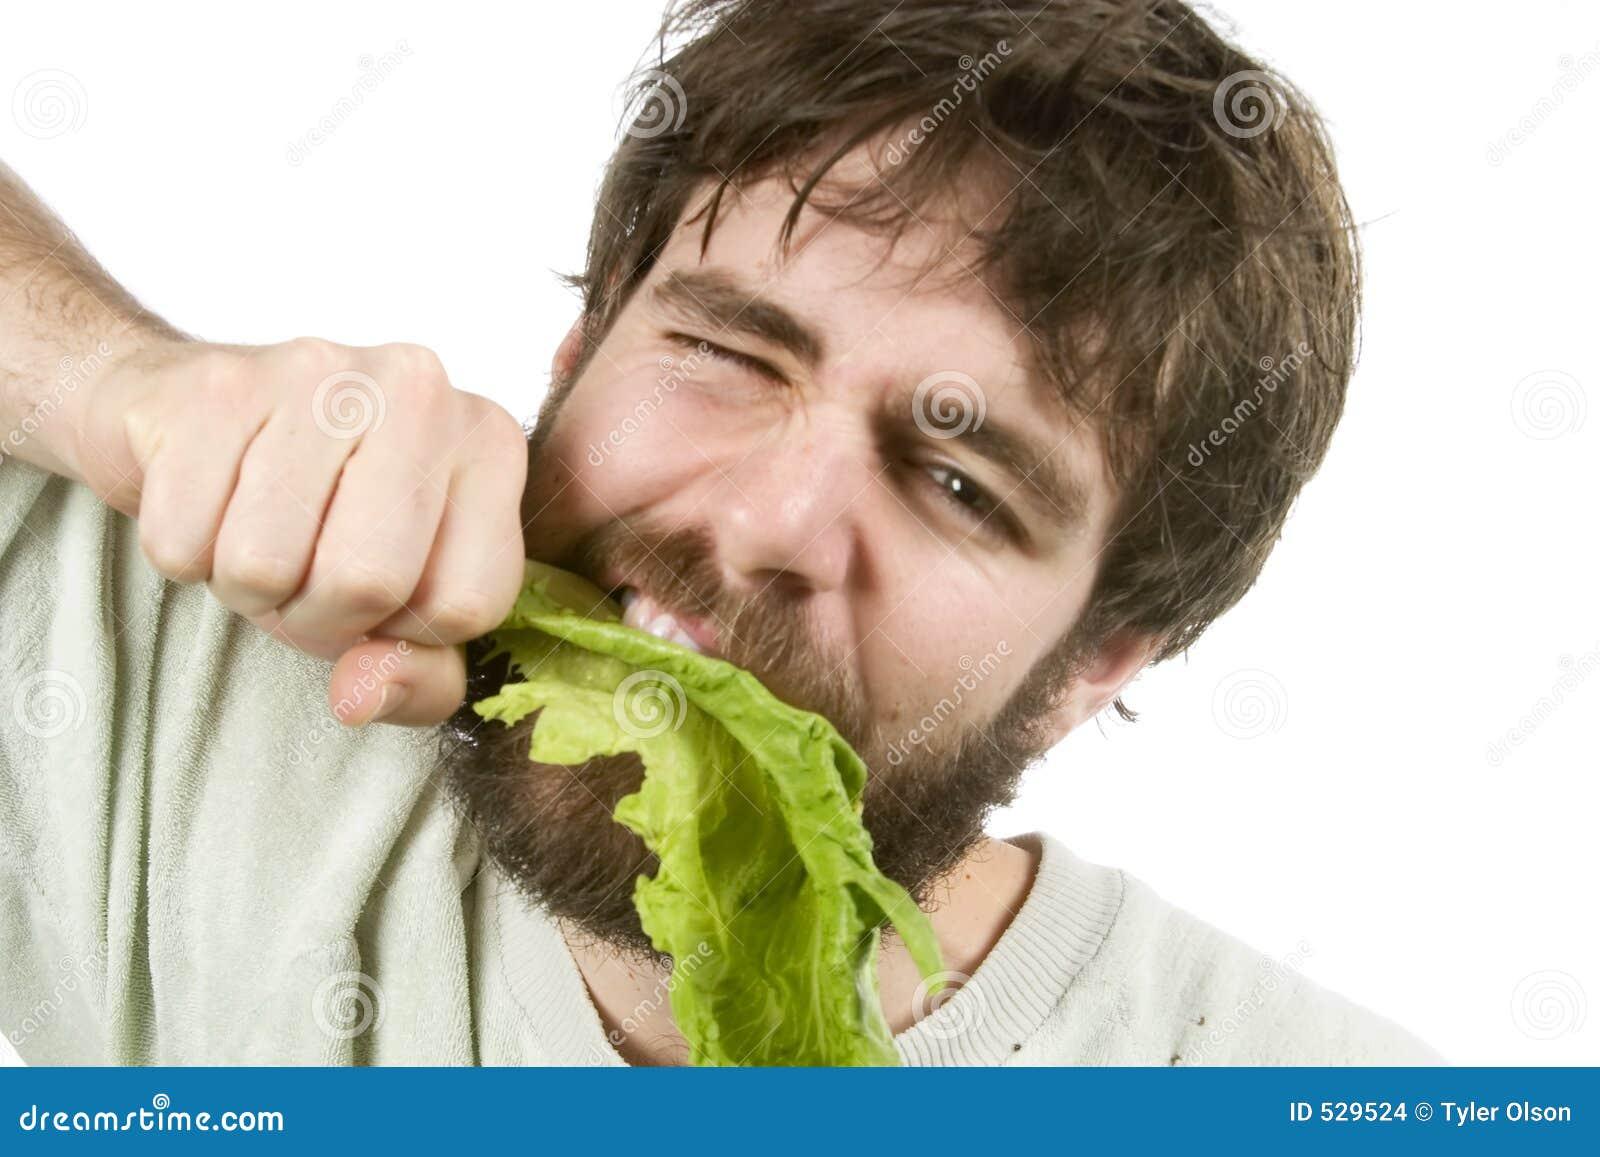 Eager Salad Eater